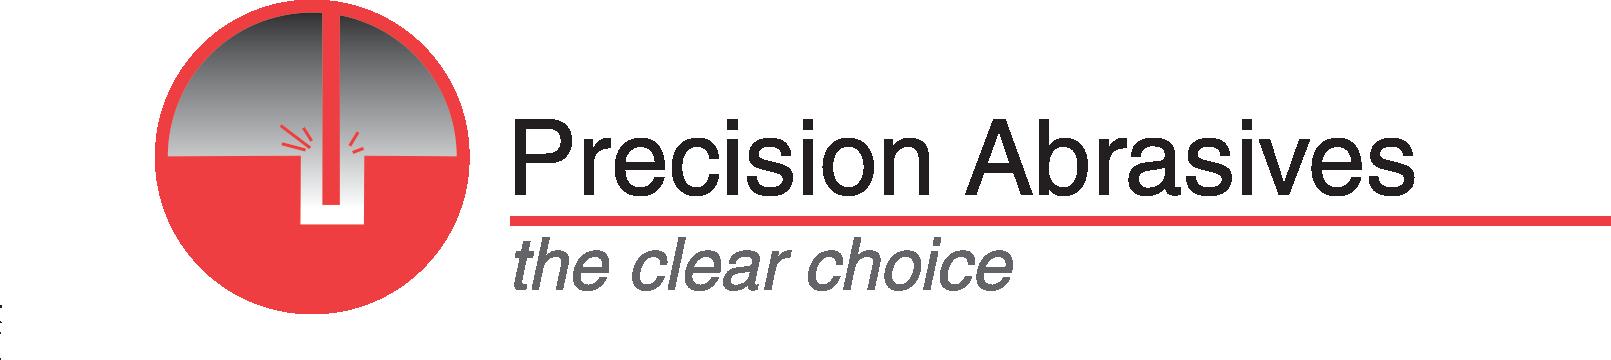 new_Pecision Abrasives_tagline.png